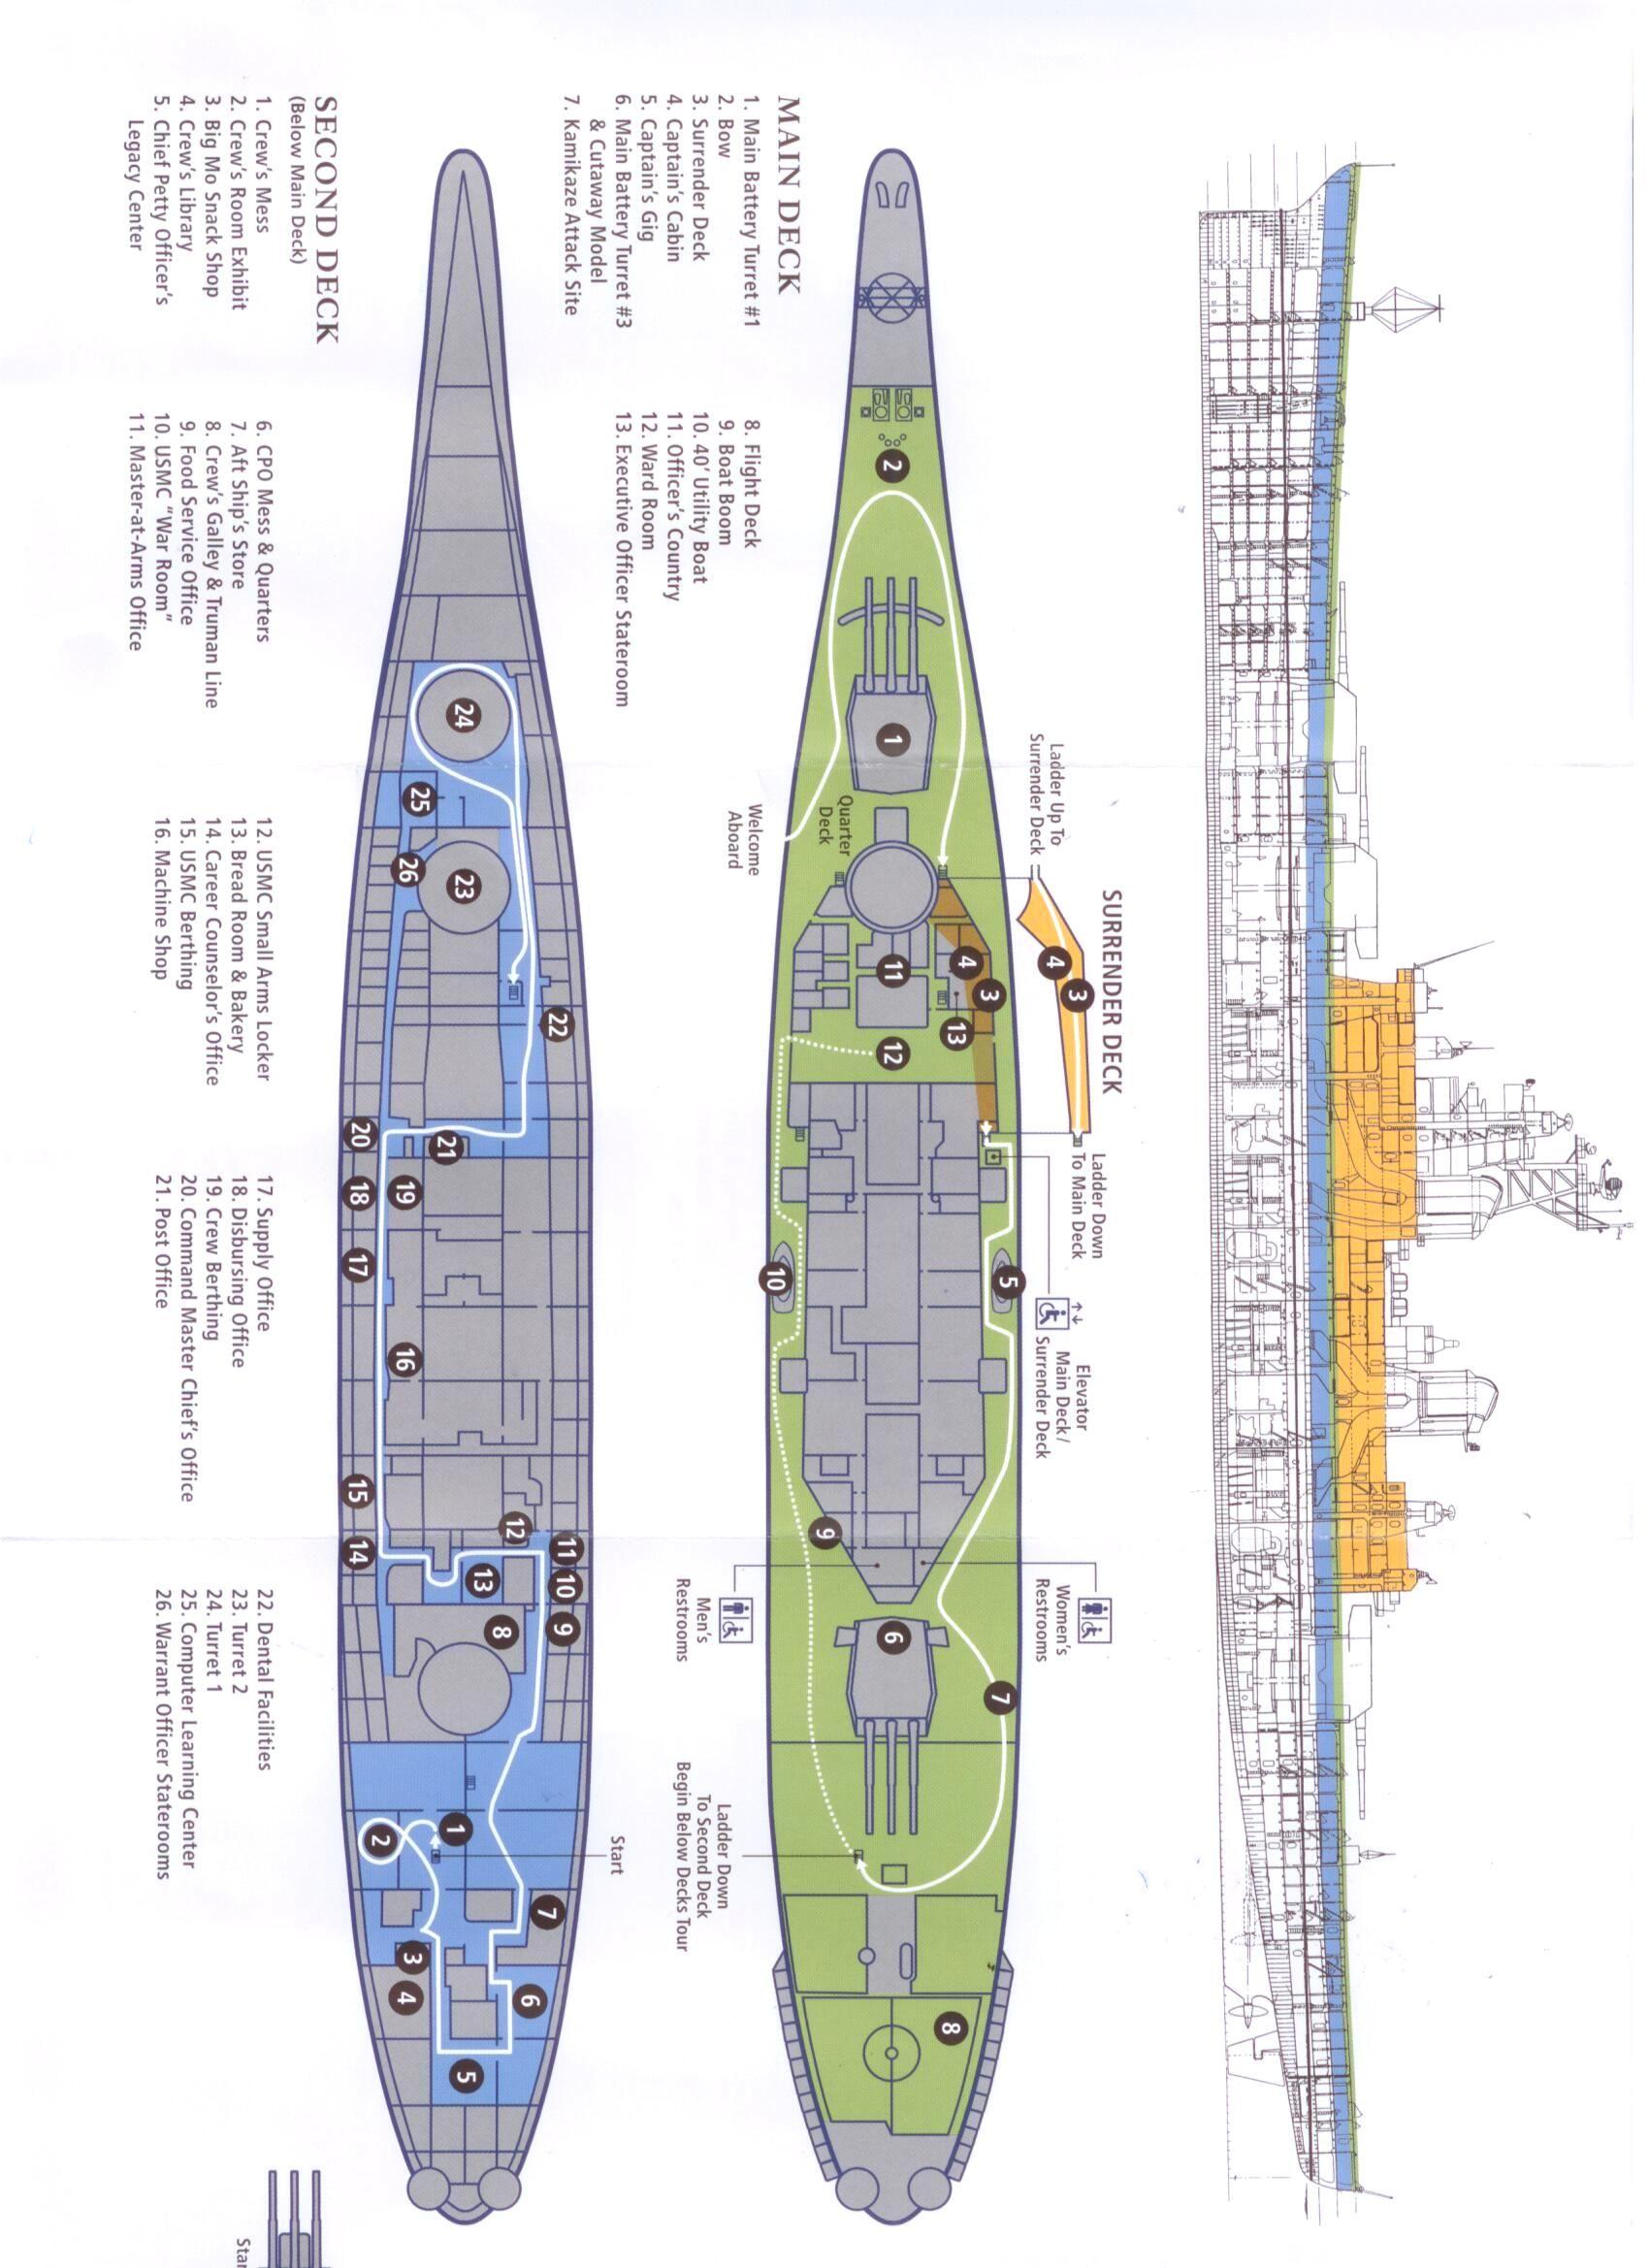 iowa class battleship hull designs google search [ 1700 x 2338 Pixel ]